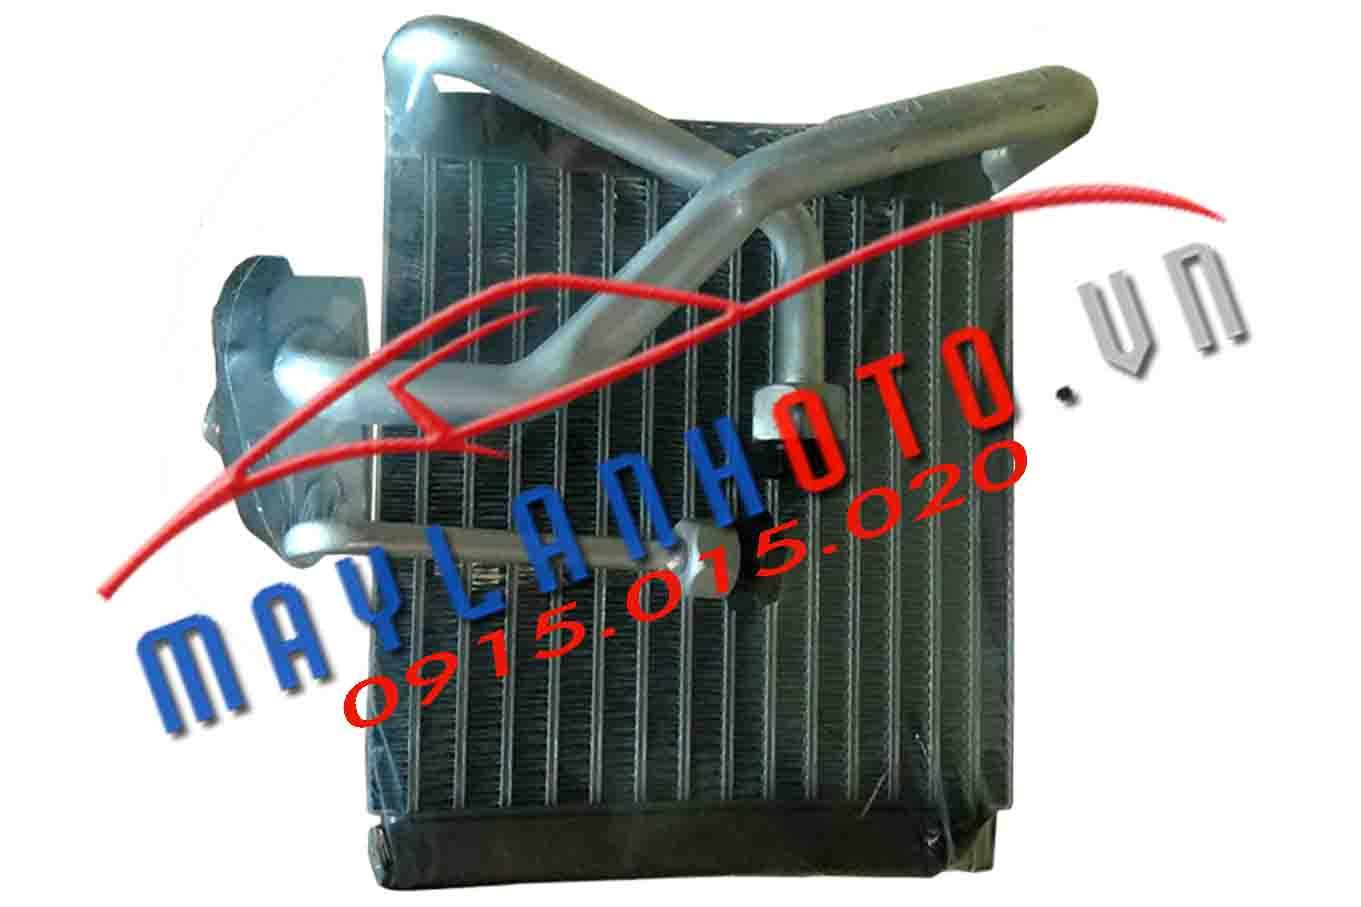 Daewoo Matiz 2 / Dàn lạnh Daewoo Matiz 2 / Giàn lạnh Daewoo Matiz 2